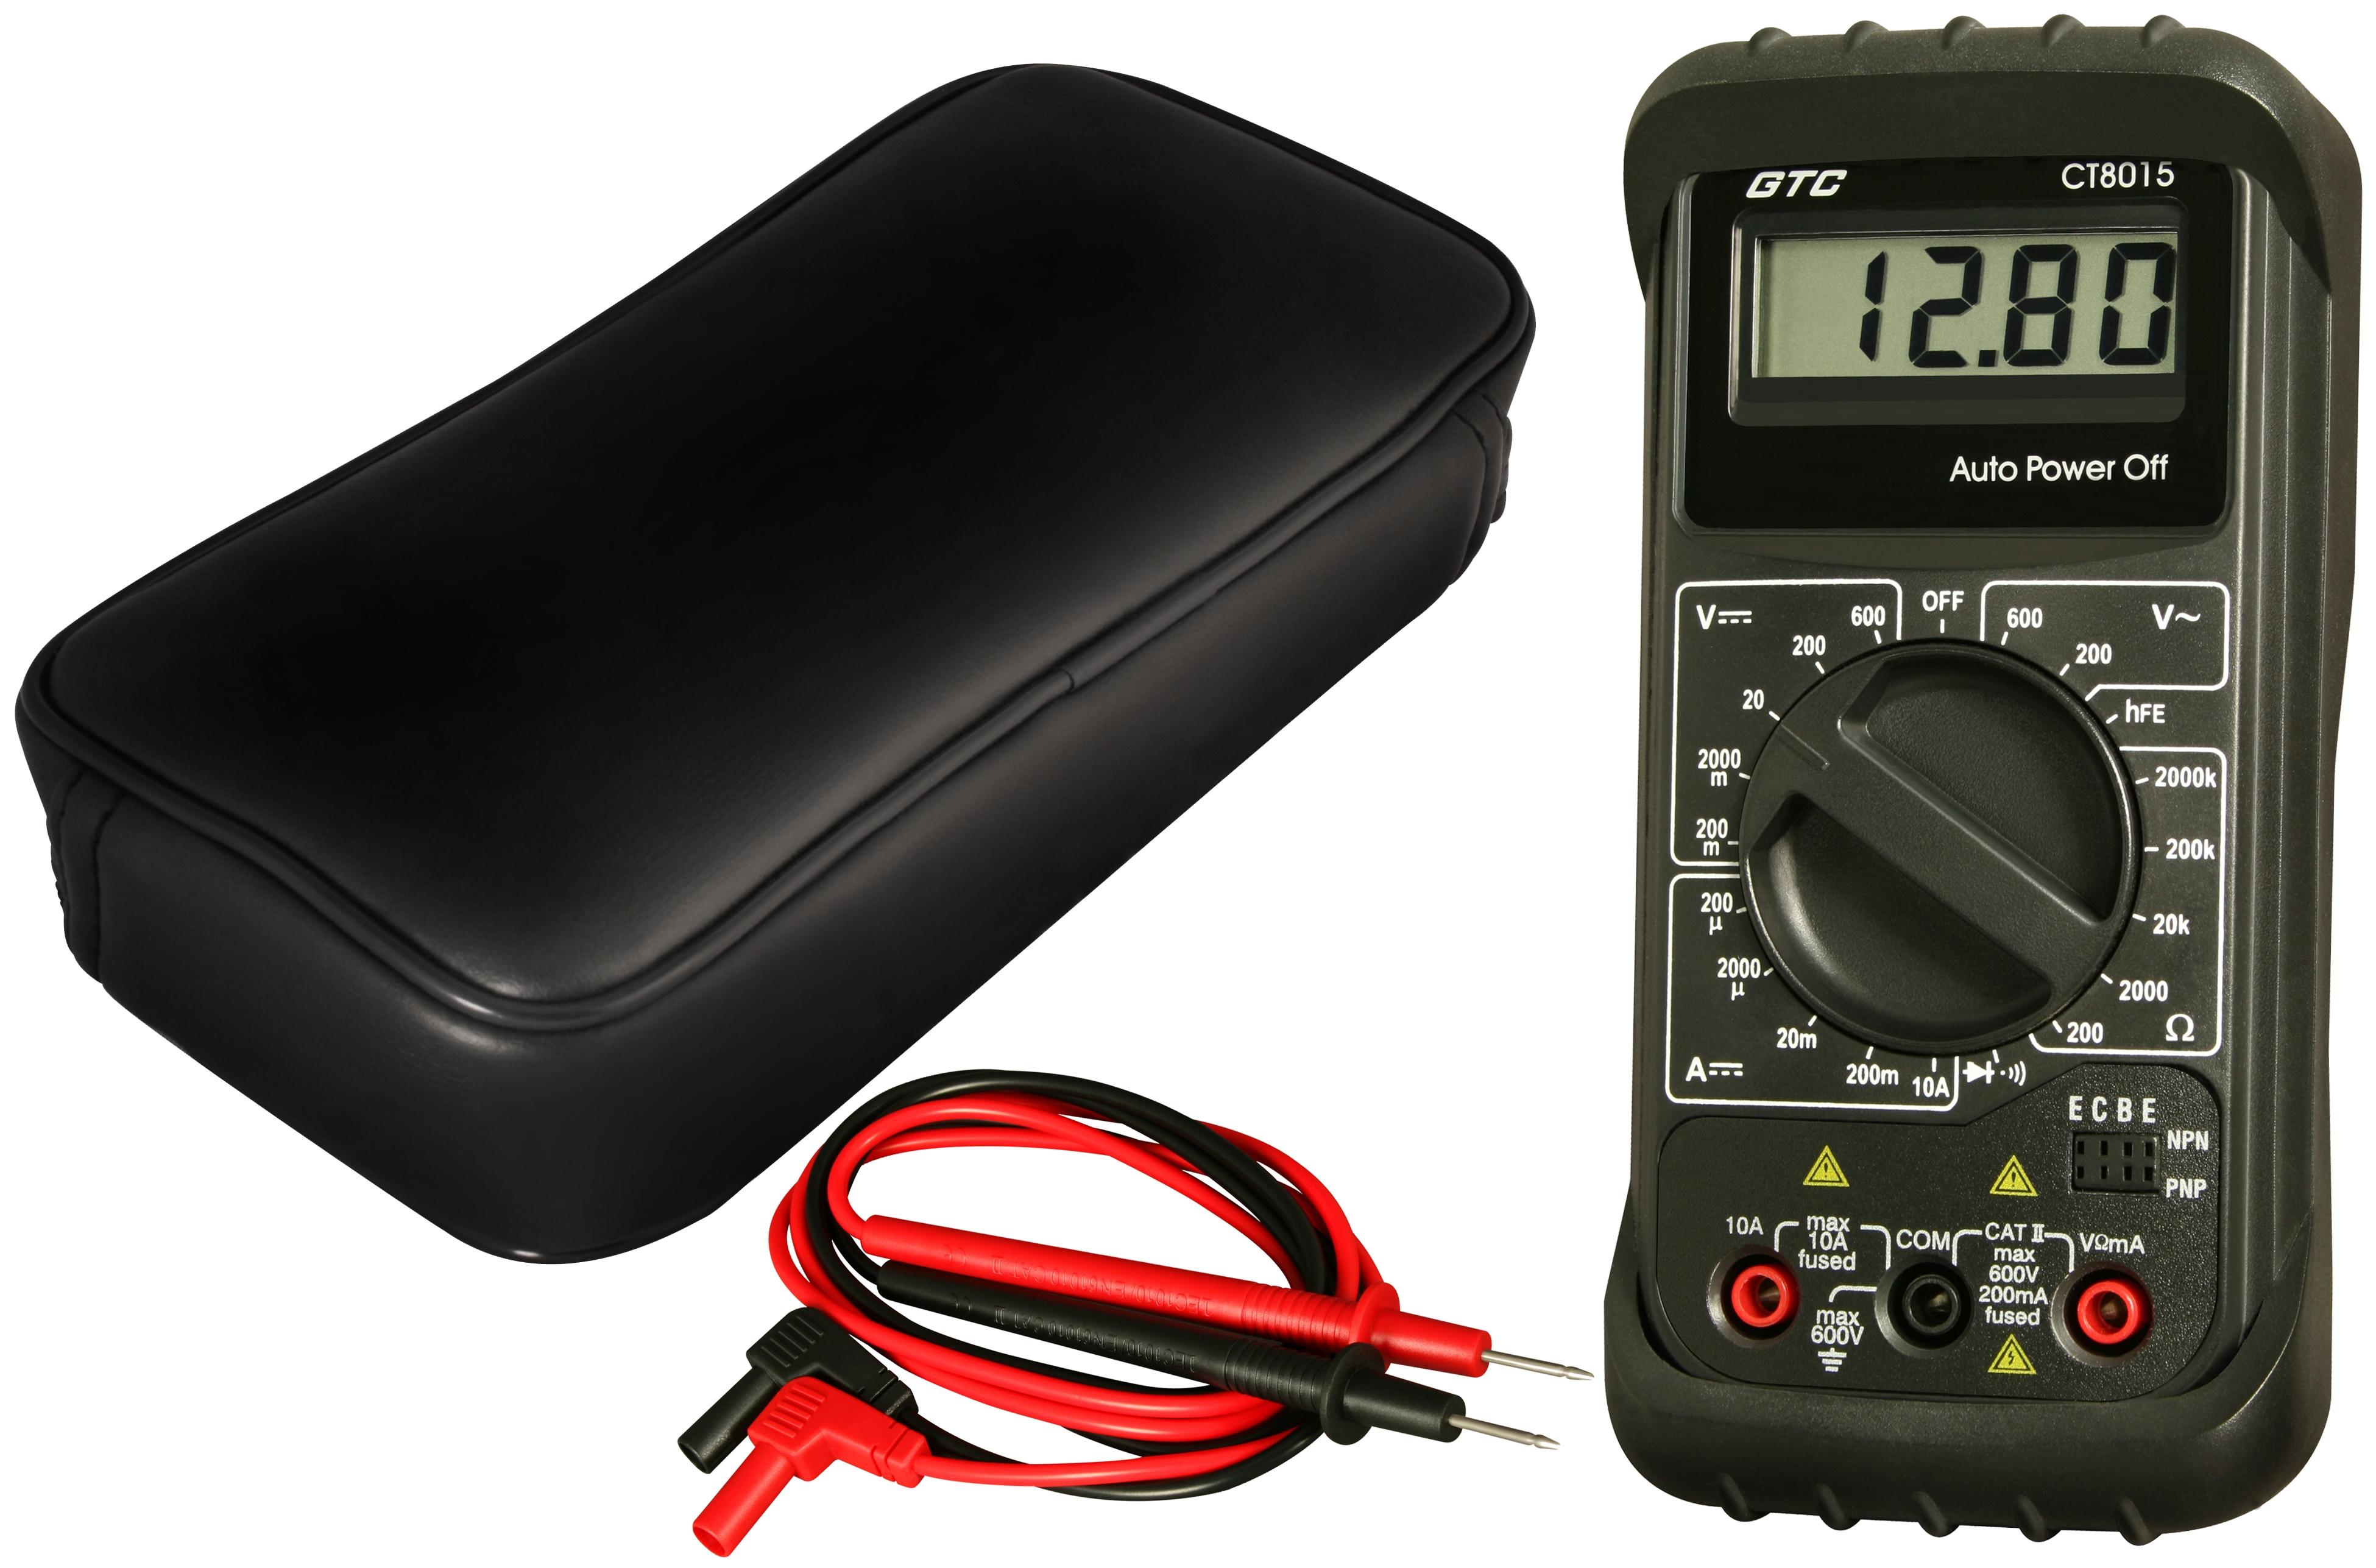 CT8015 Manual Range Digital Multimeter from General Technologies